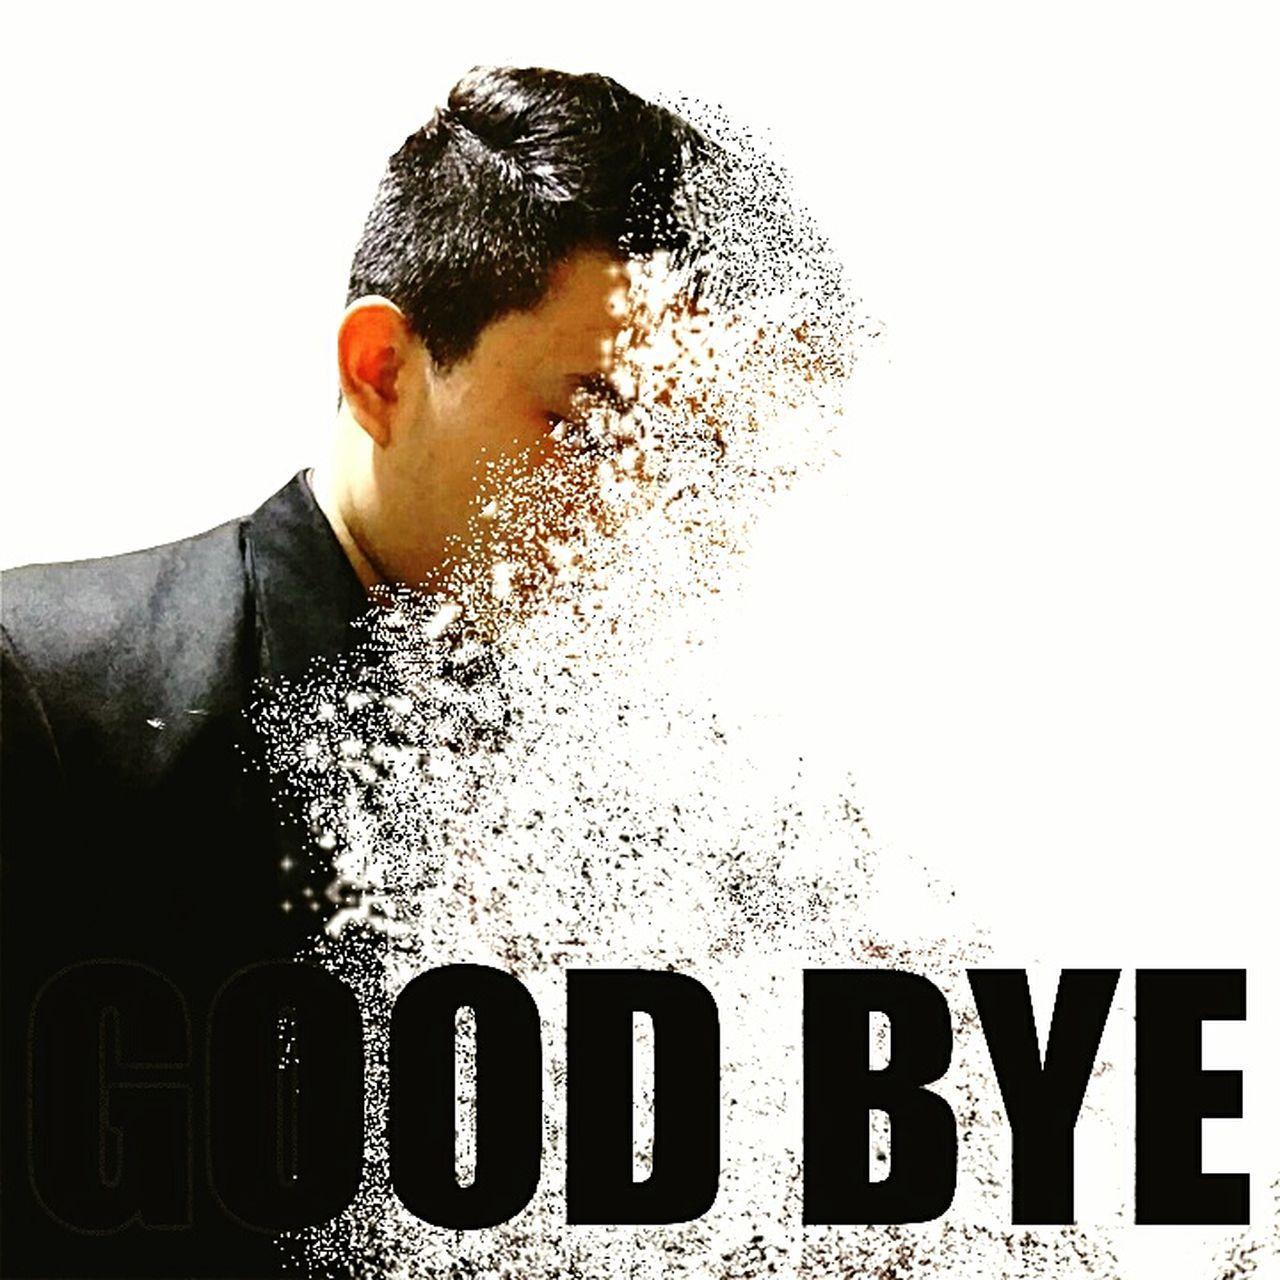 disigeneration from me Disintegration Studio Shot White Background Goodbye Me Men First Eyeem Photo